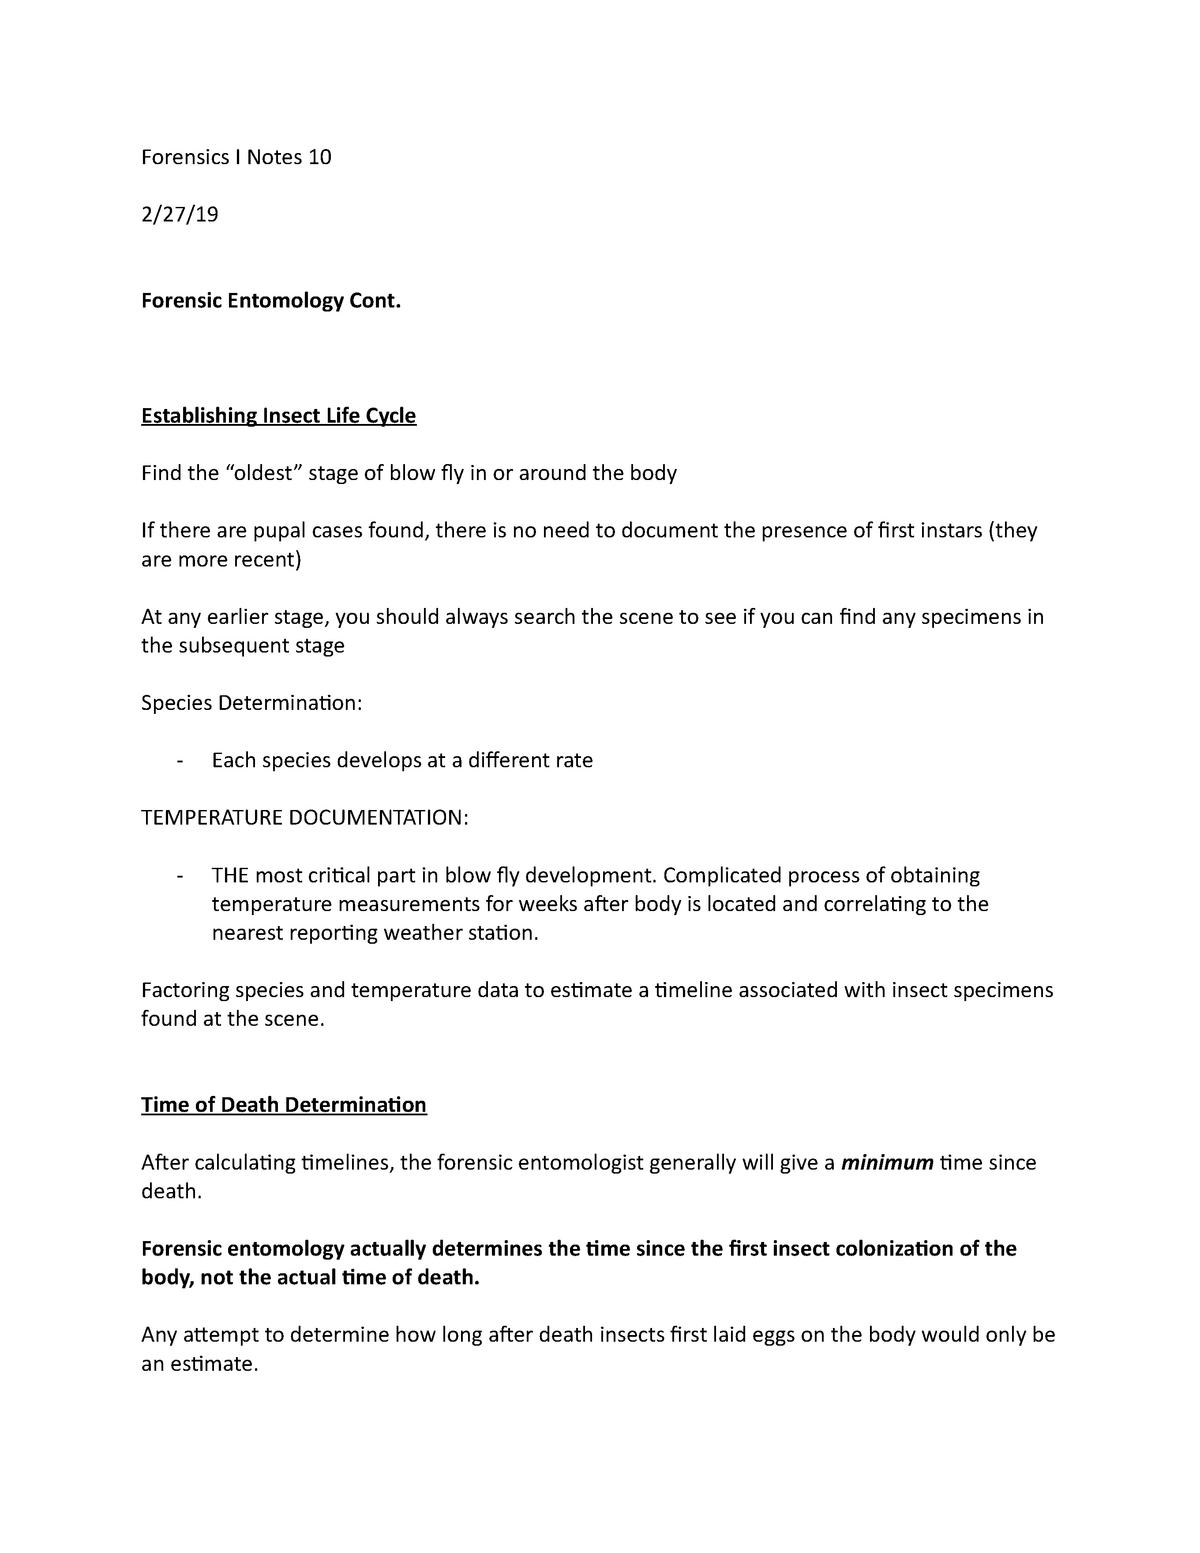 Forensics I Notes 10 - CRJU 4004: Criminal Forensics I - StuDocu